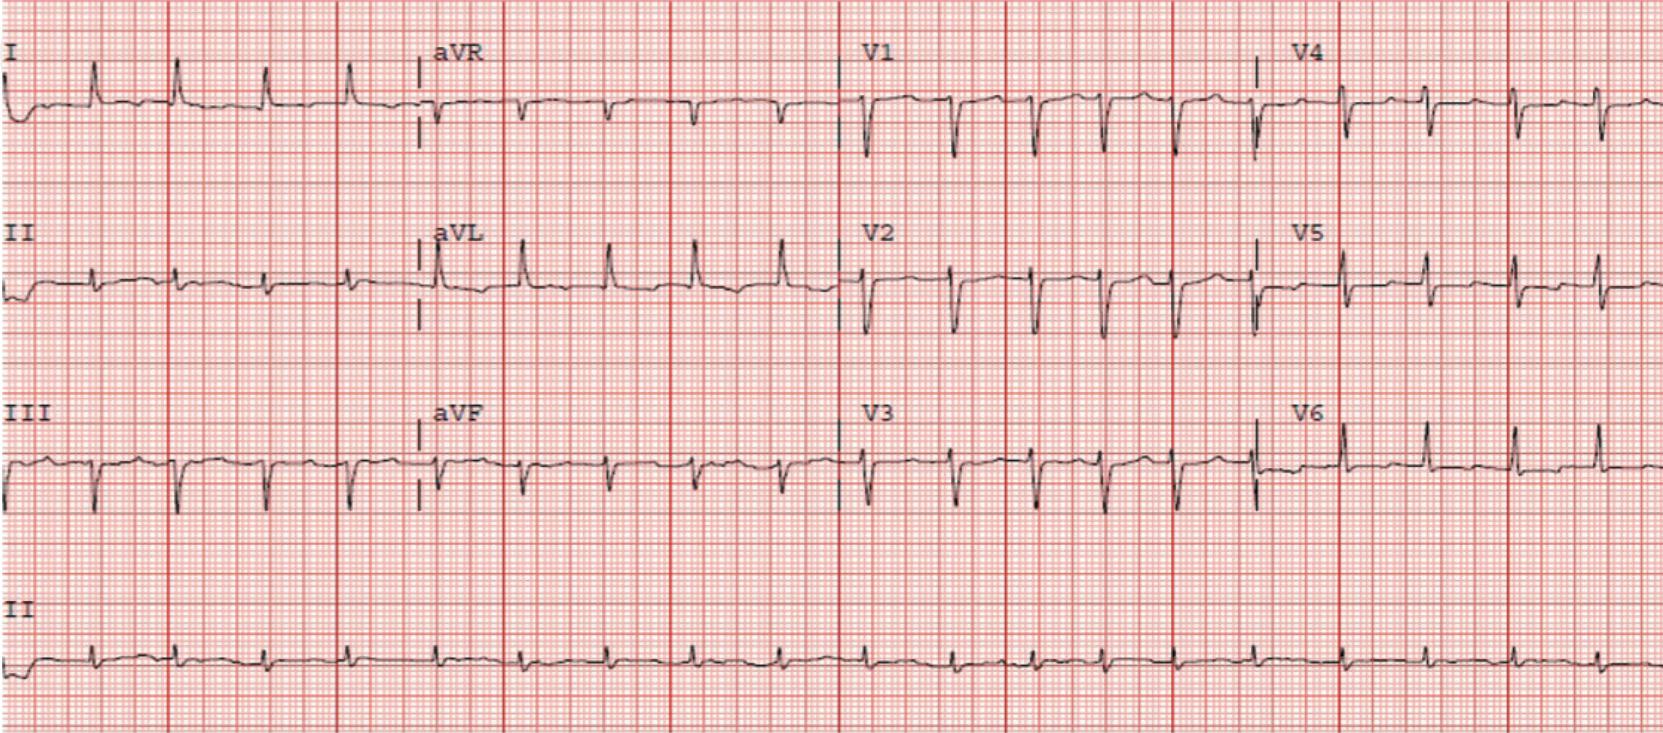 Agudo Figure 1. Initial electrocardiogram (ECG): sinus tachycardia with narrow QRS complex